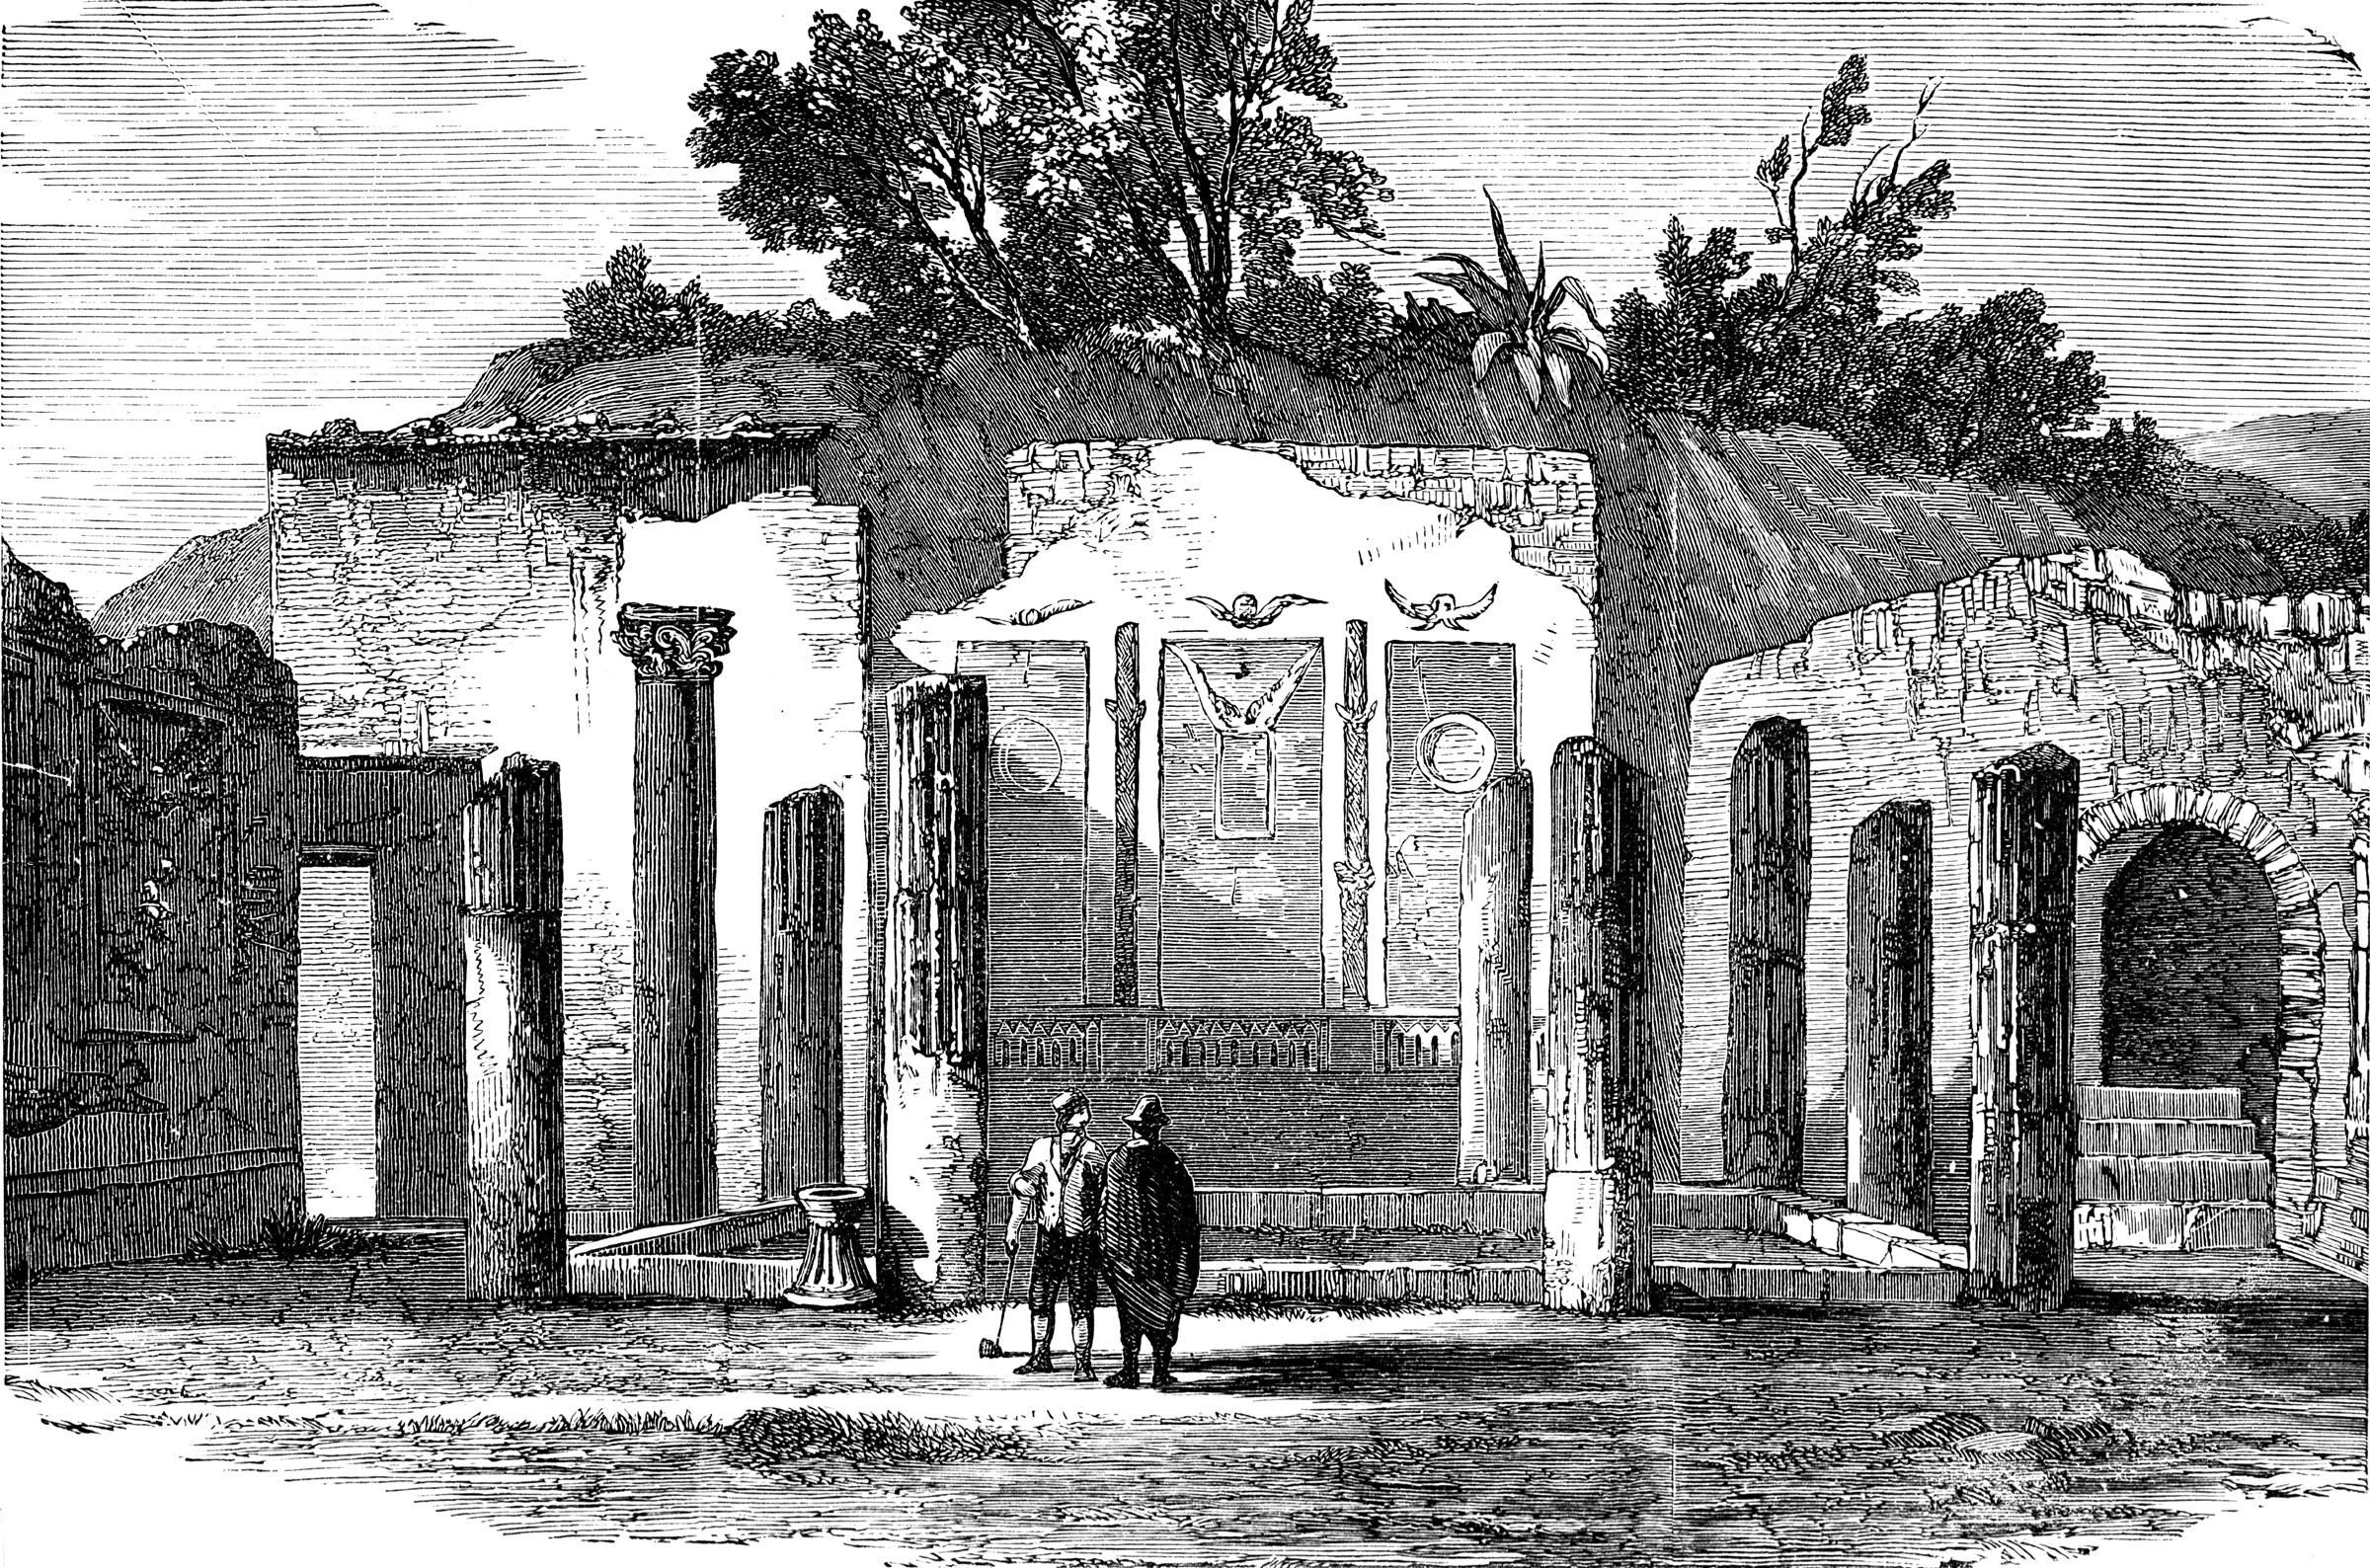 pompeii_ruins_1.jpg